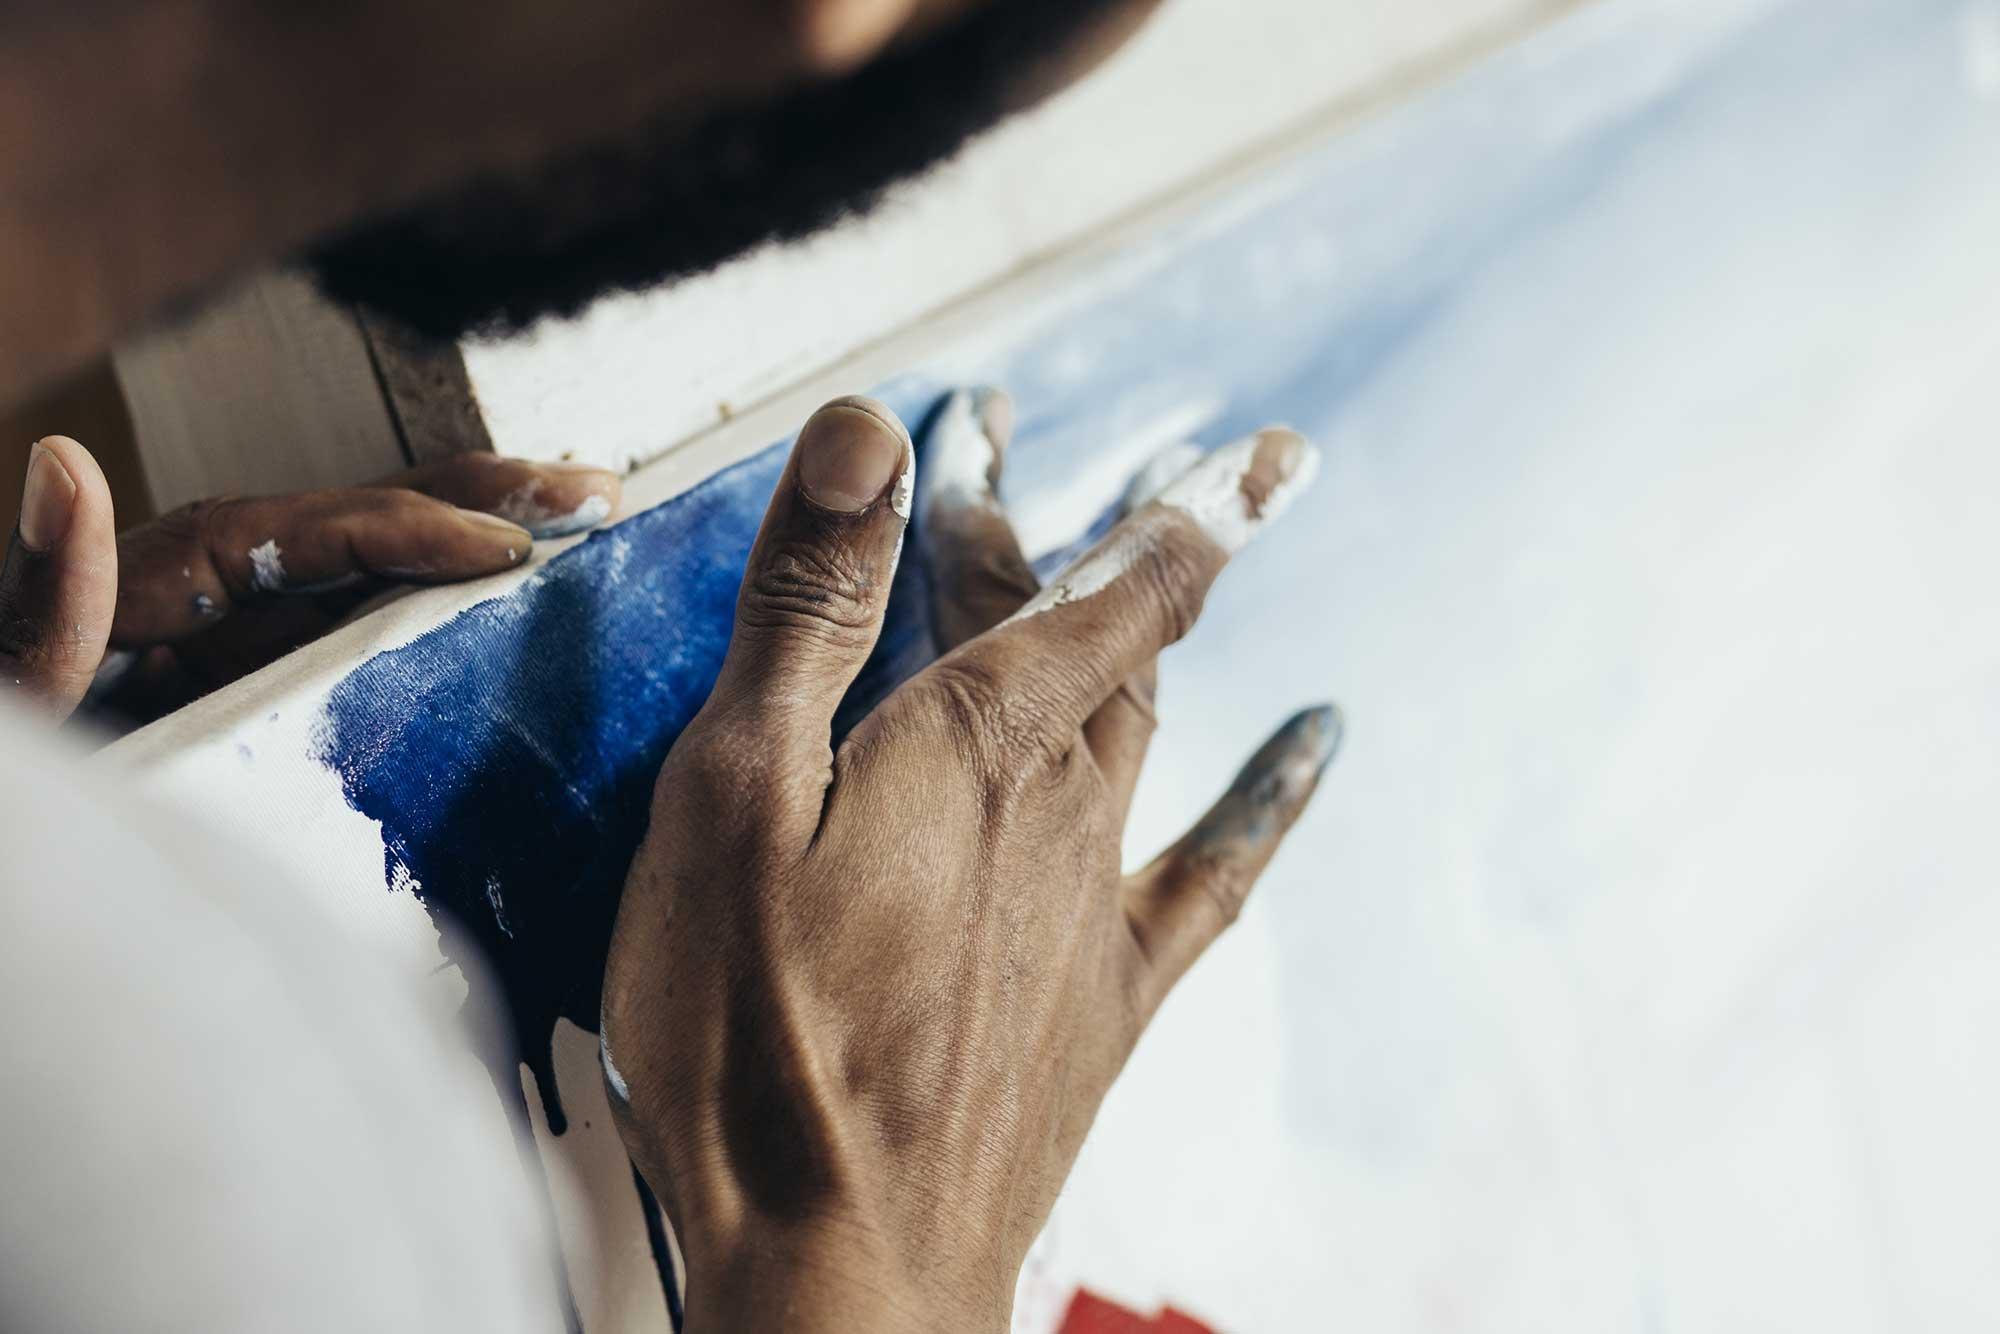 Artist using blue paint